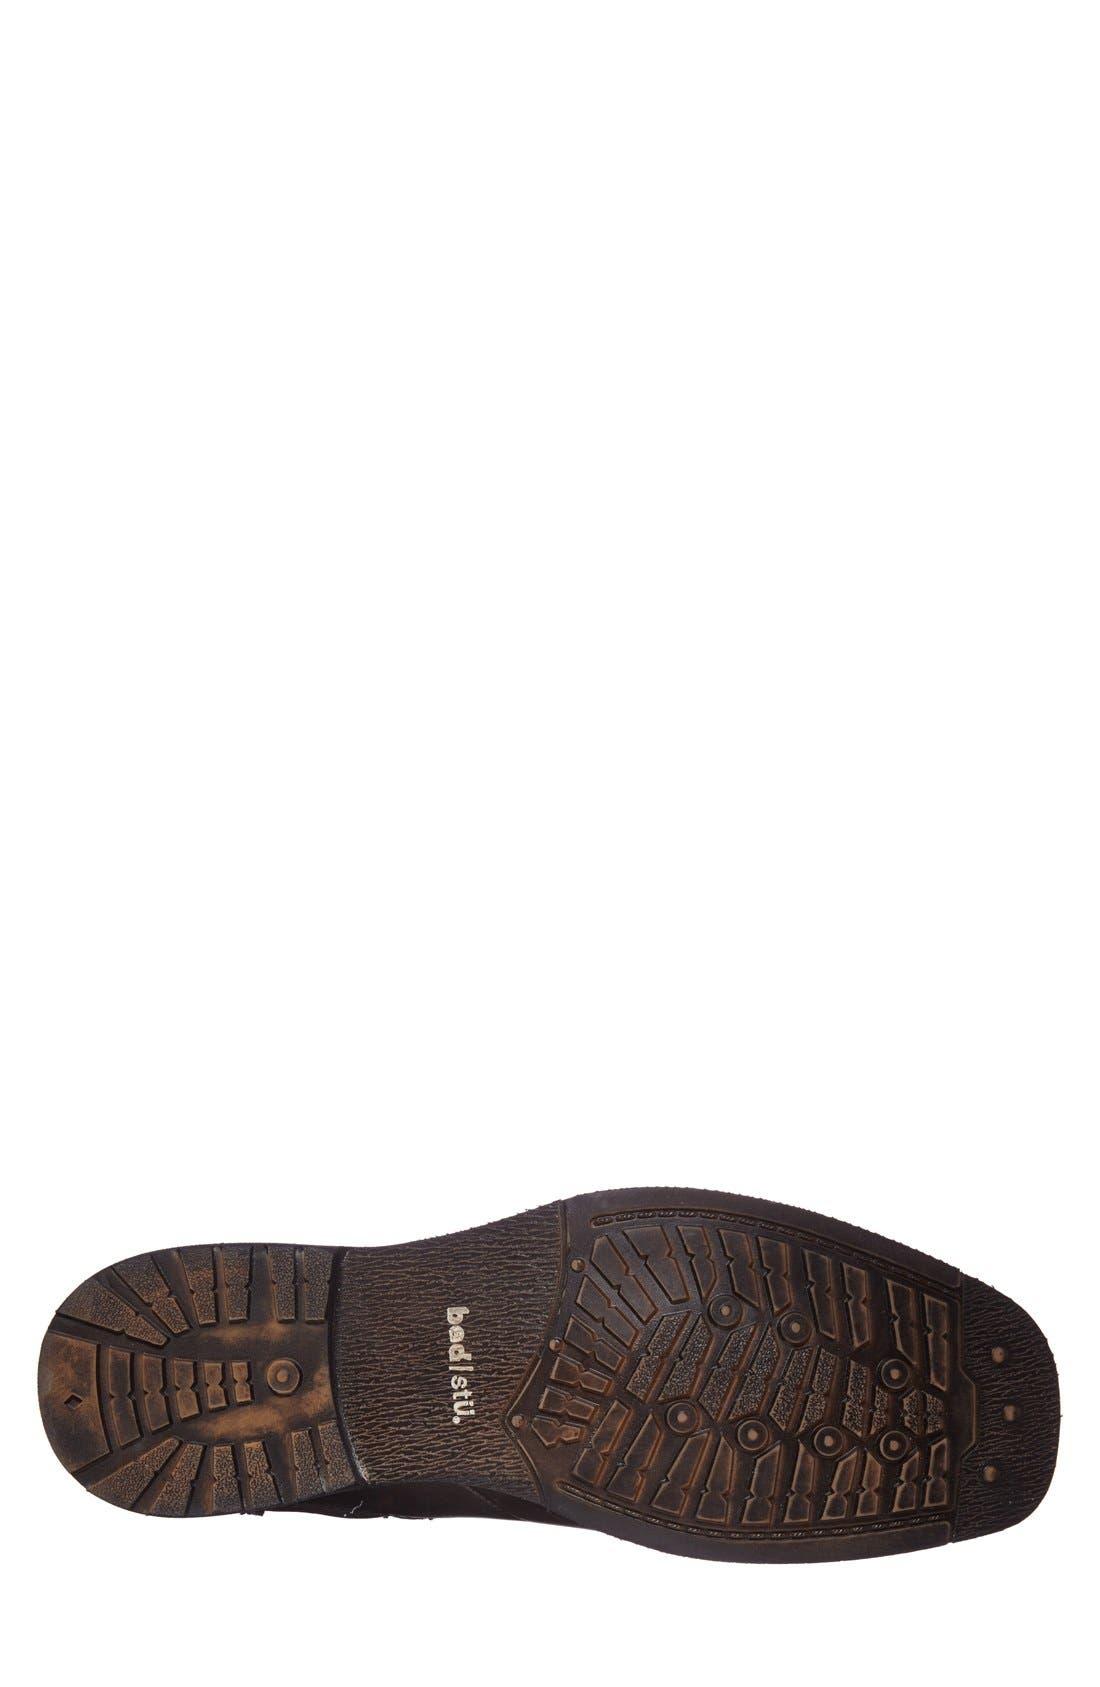 Alternate Image 4  - Bed Stu 'Burst' Boot (Online Only) (Men)